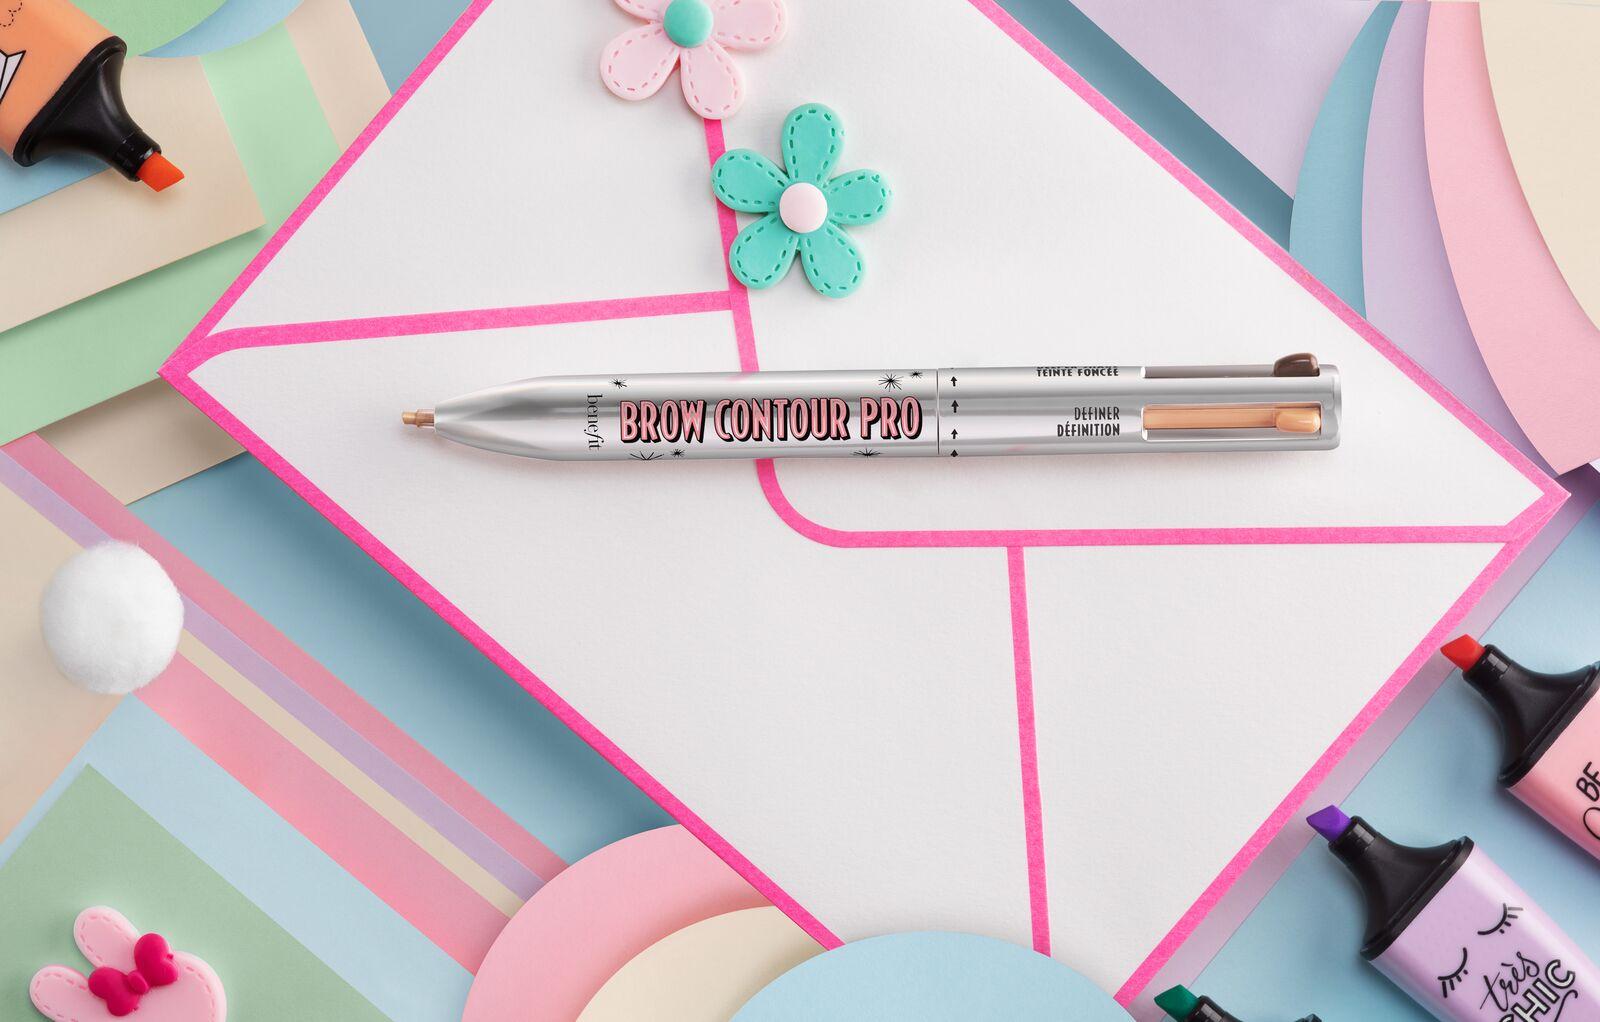 Benefit Eyebrow Contour Pen Product Photography